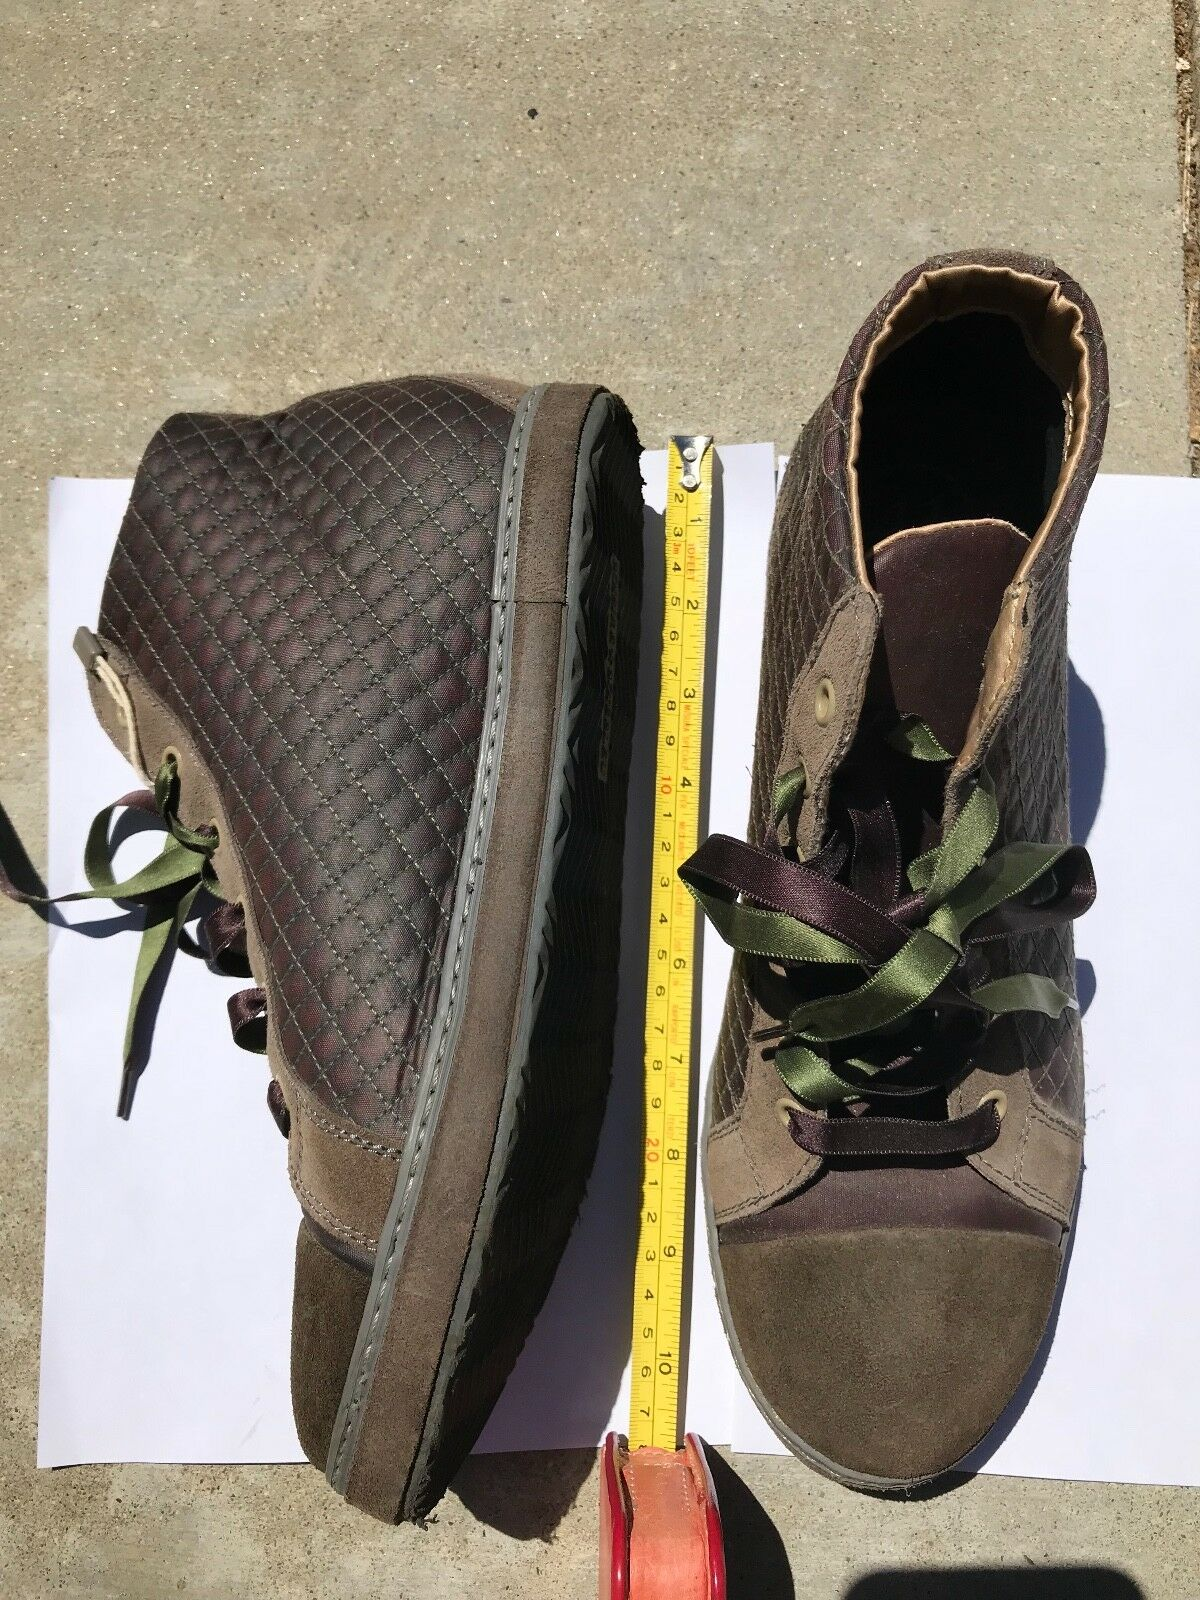 SOISIRESOIEBLWomen's Hightop Sneakers - Size 10 (US) - MADE IN ITALY